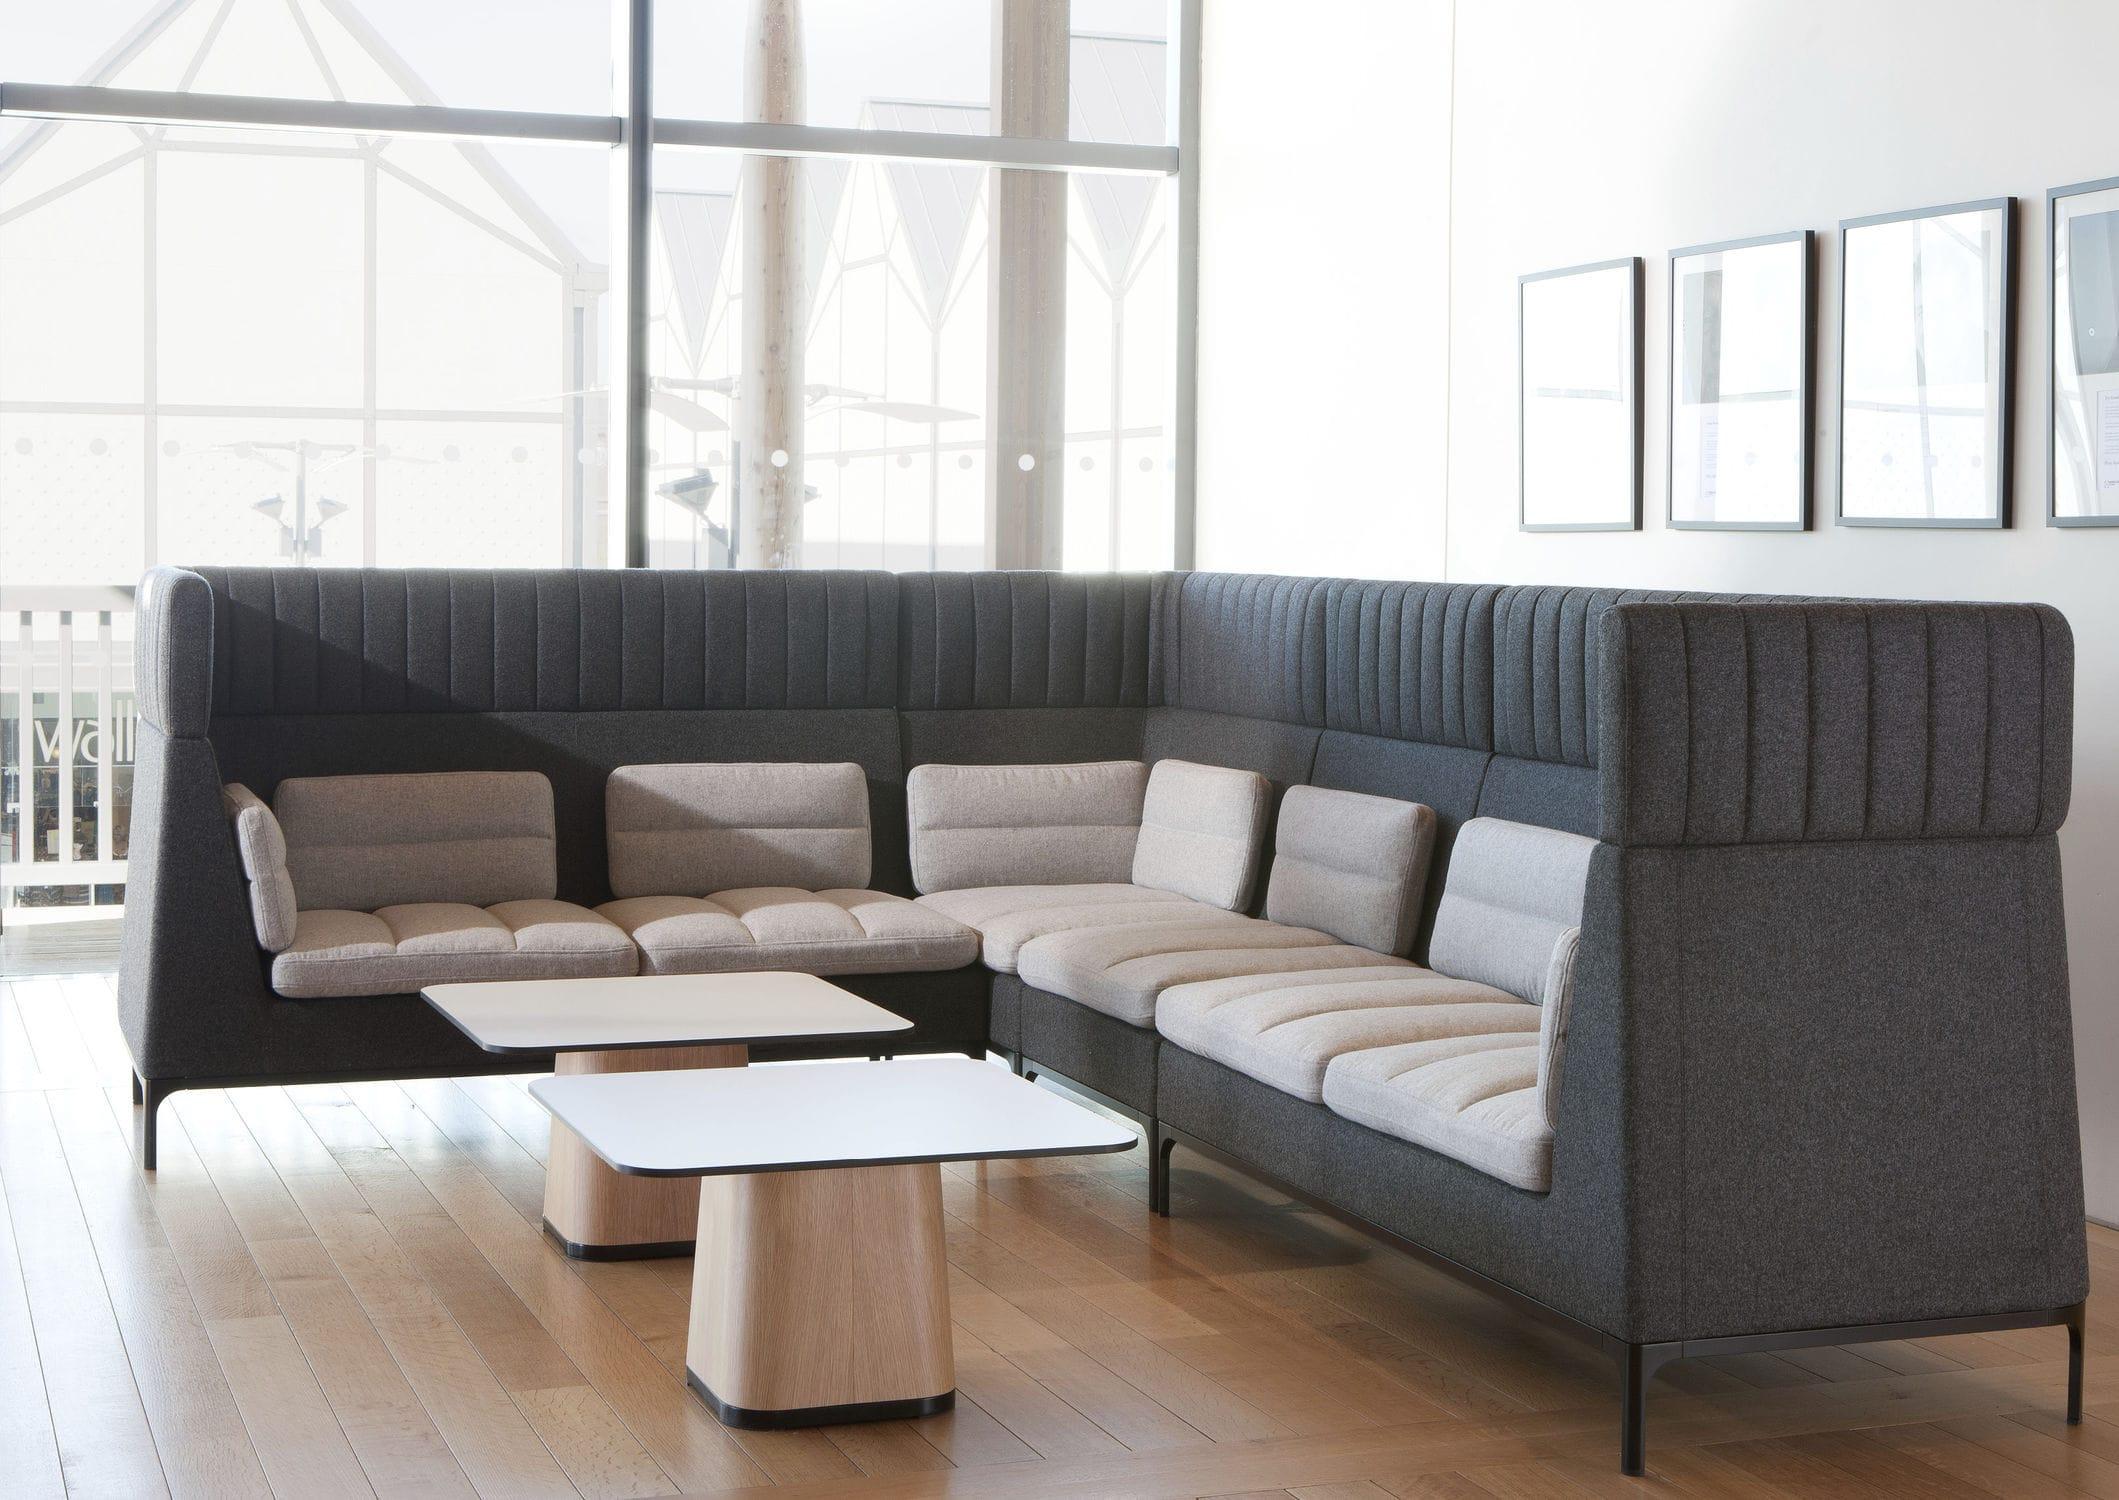 Modular Sofa / Contemporary / Aluminum / Fabric – Havenmark Pertaining To Haven Sofa Chairs (Image 19 of 25)